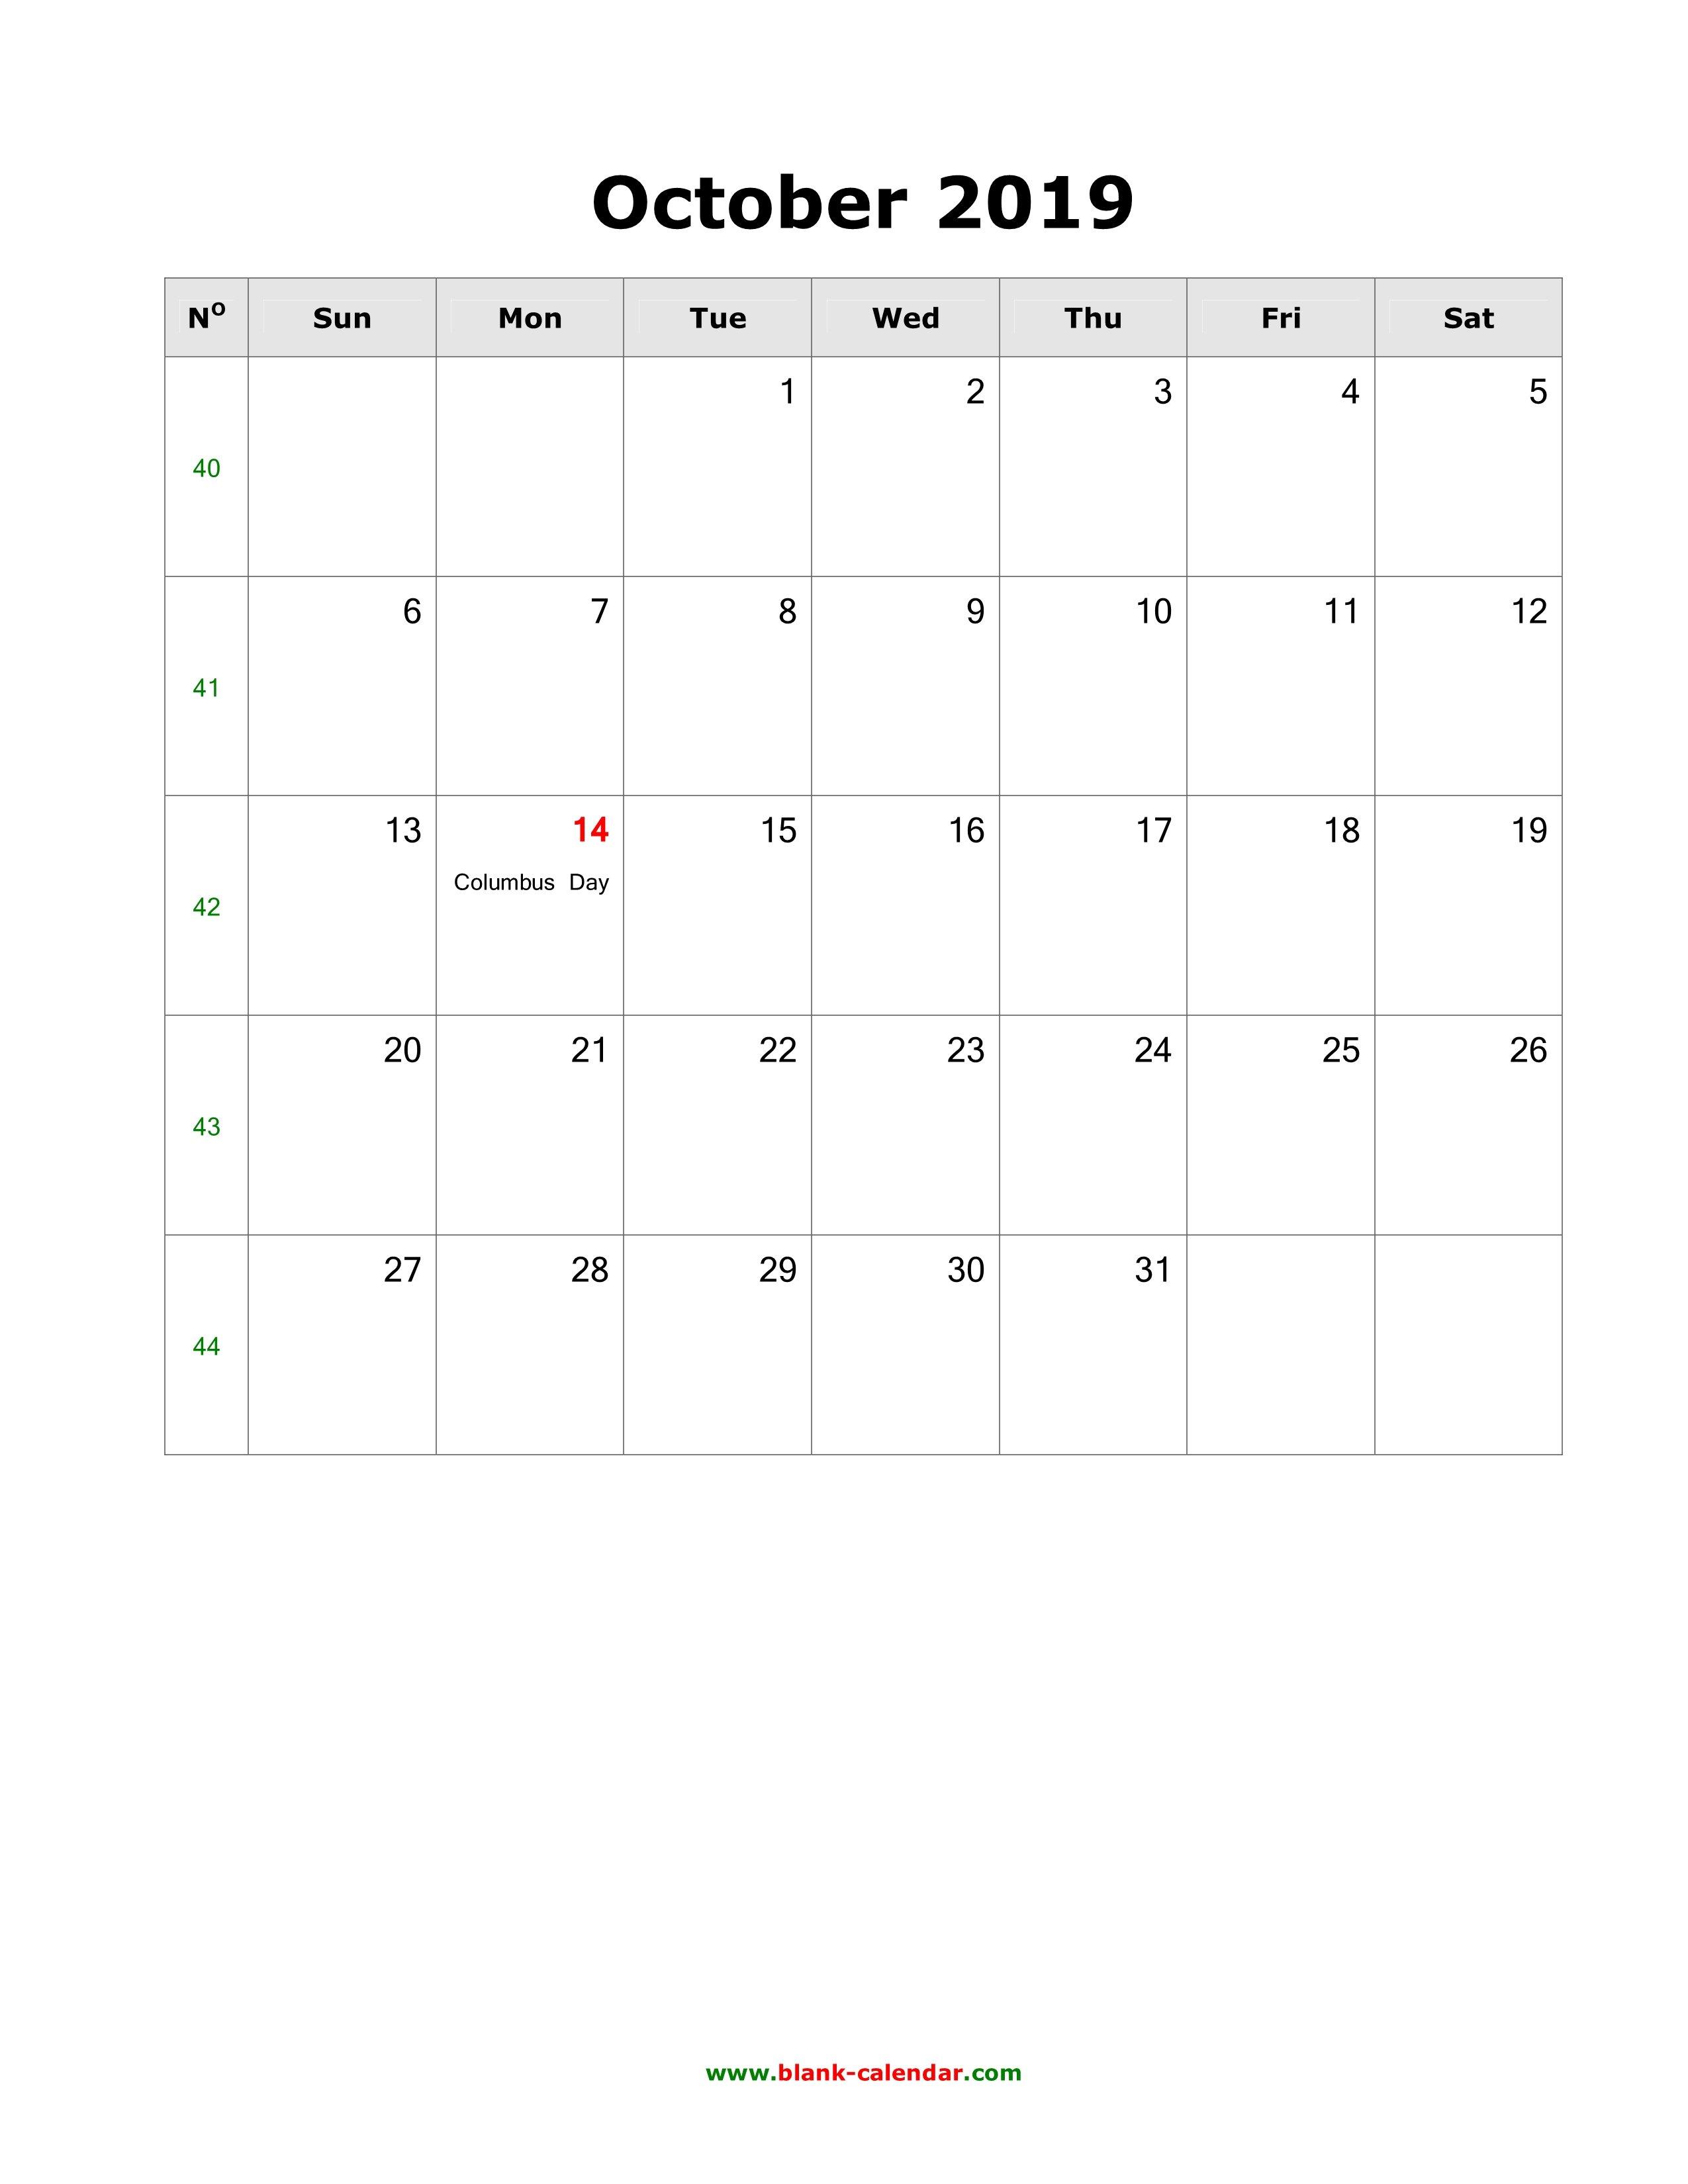 Download October 2019 Blank Calendar With Us Holidays (Vertical) Calendar 0Ct 2019